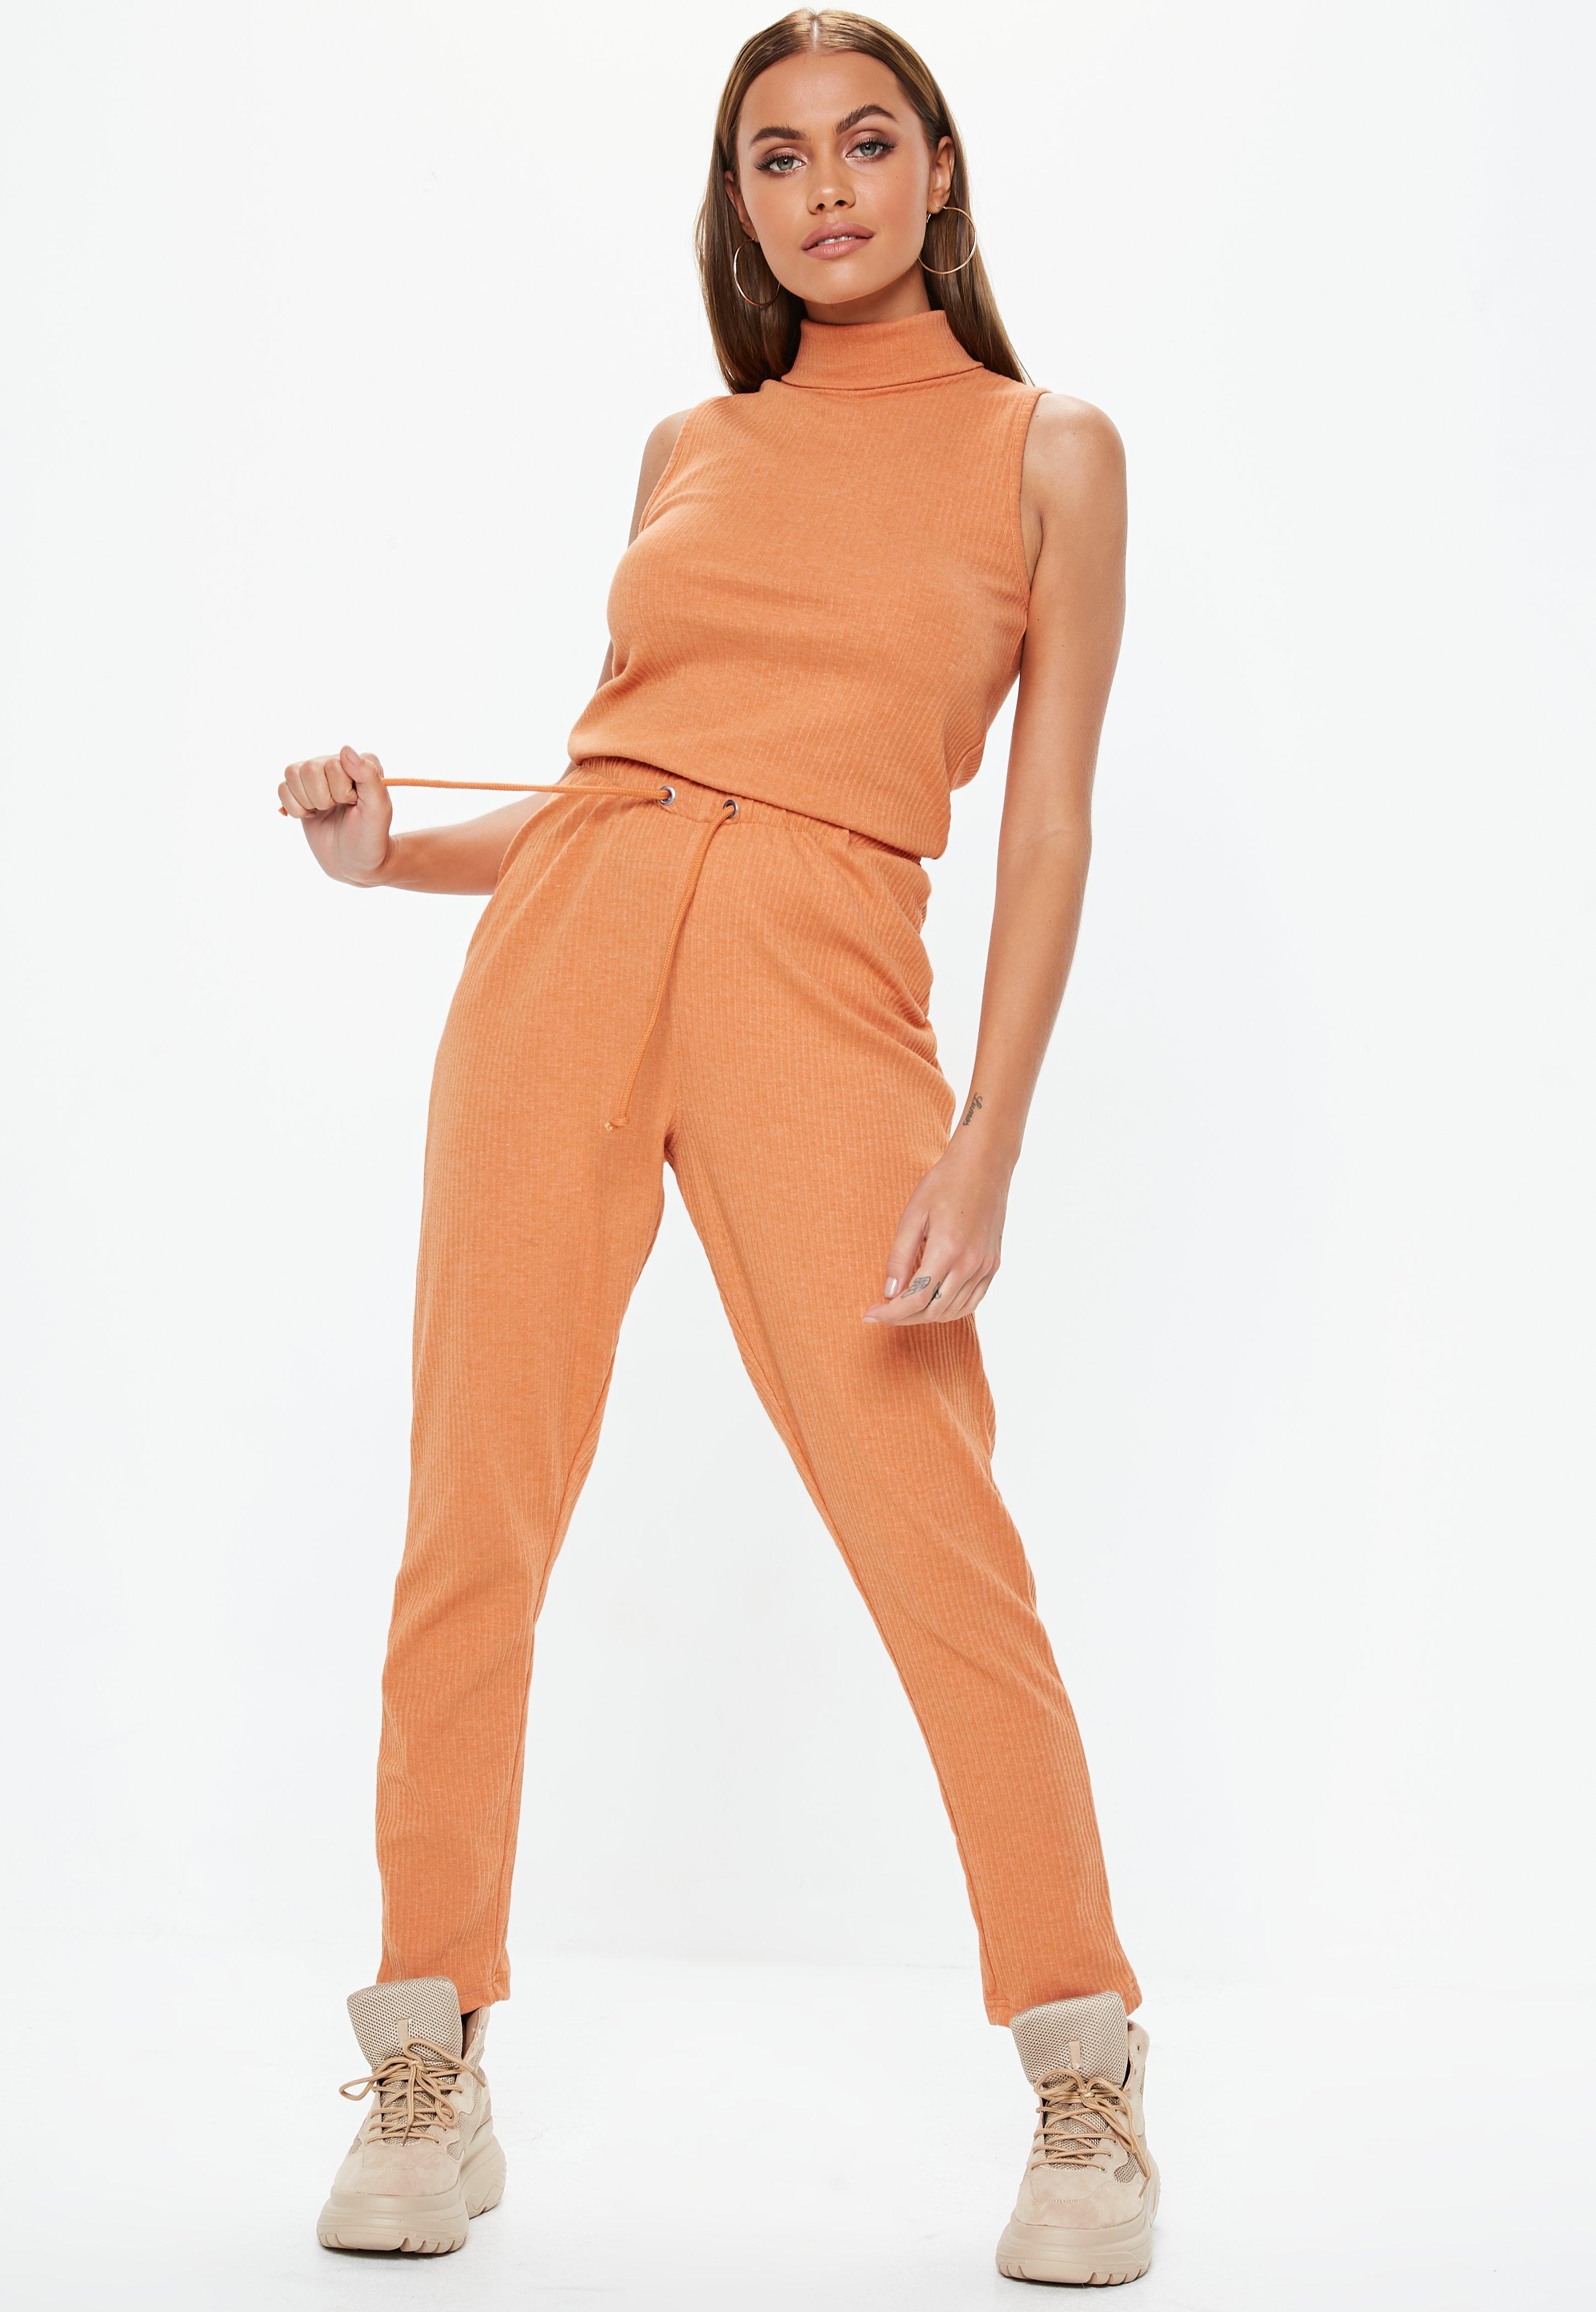 Soldes   Vêtement   mode femme pas cher - Missguided 3d7d7aa3ffbe